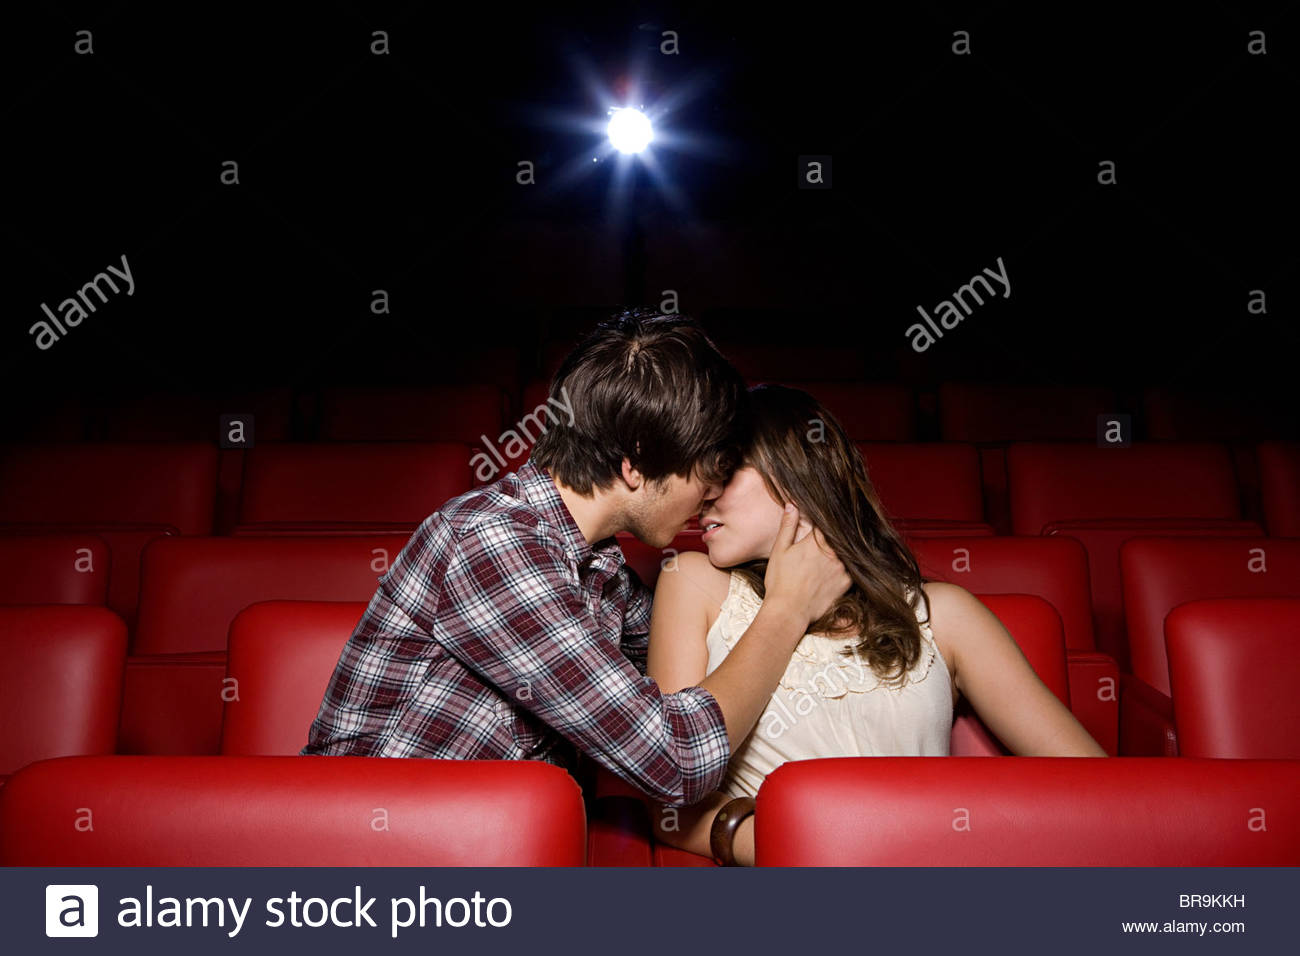 erotikkino paare beim sex beobachten